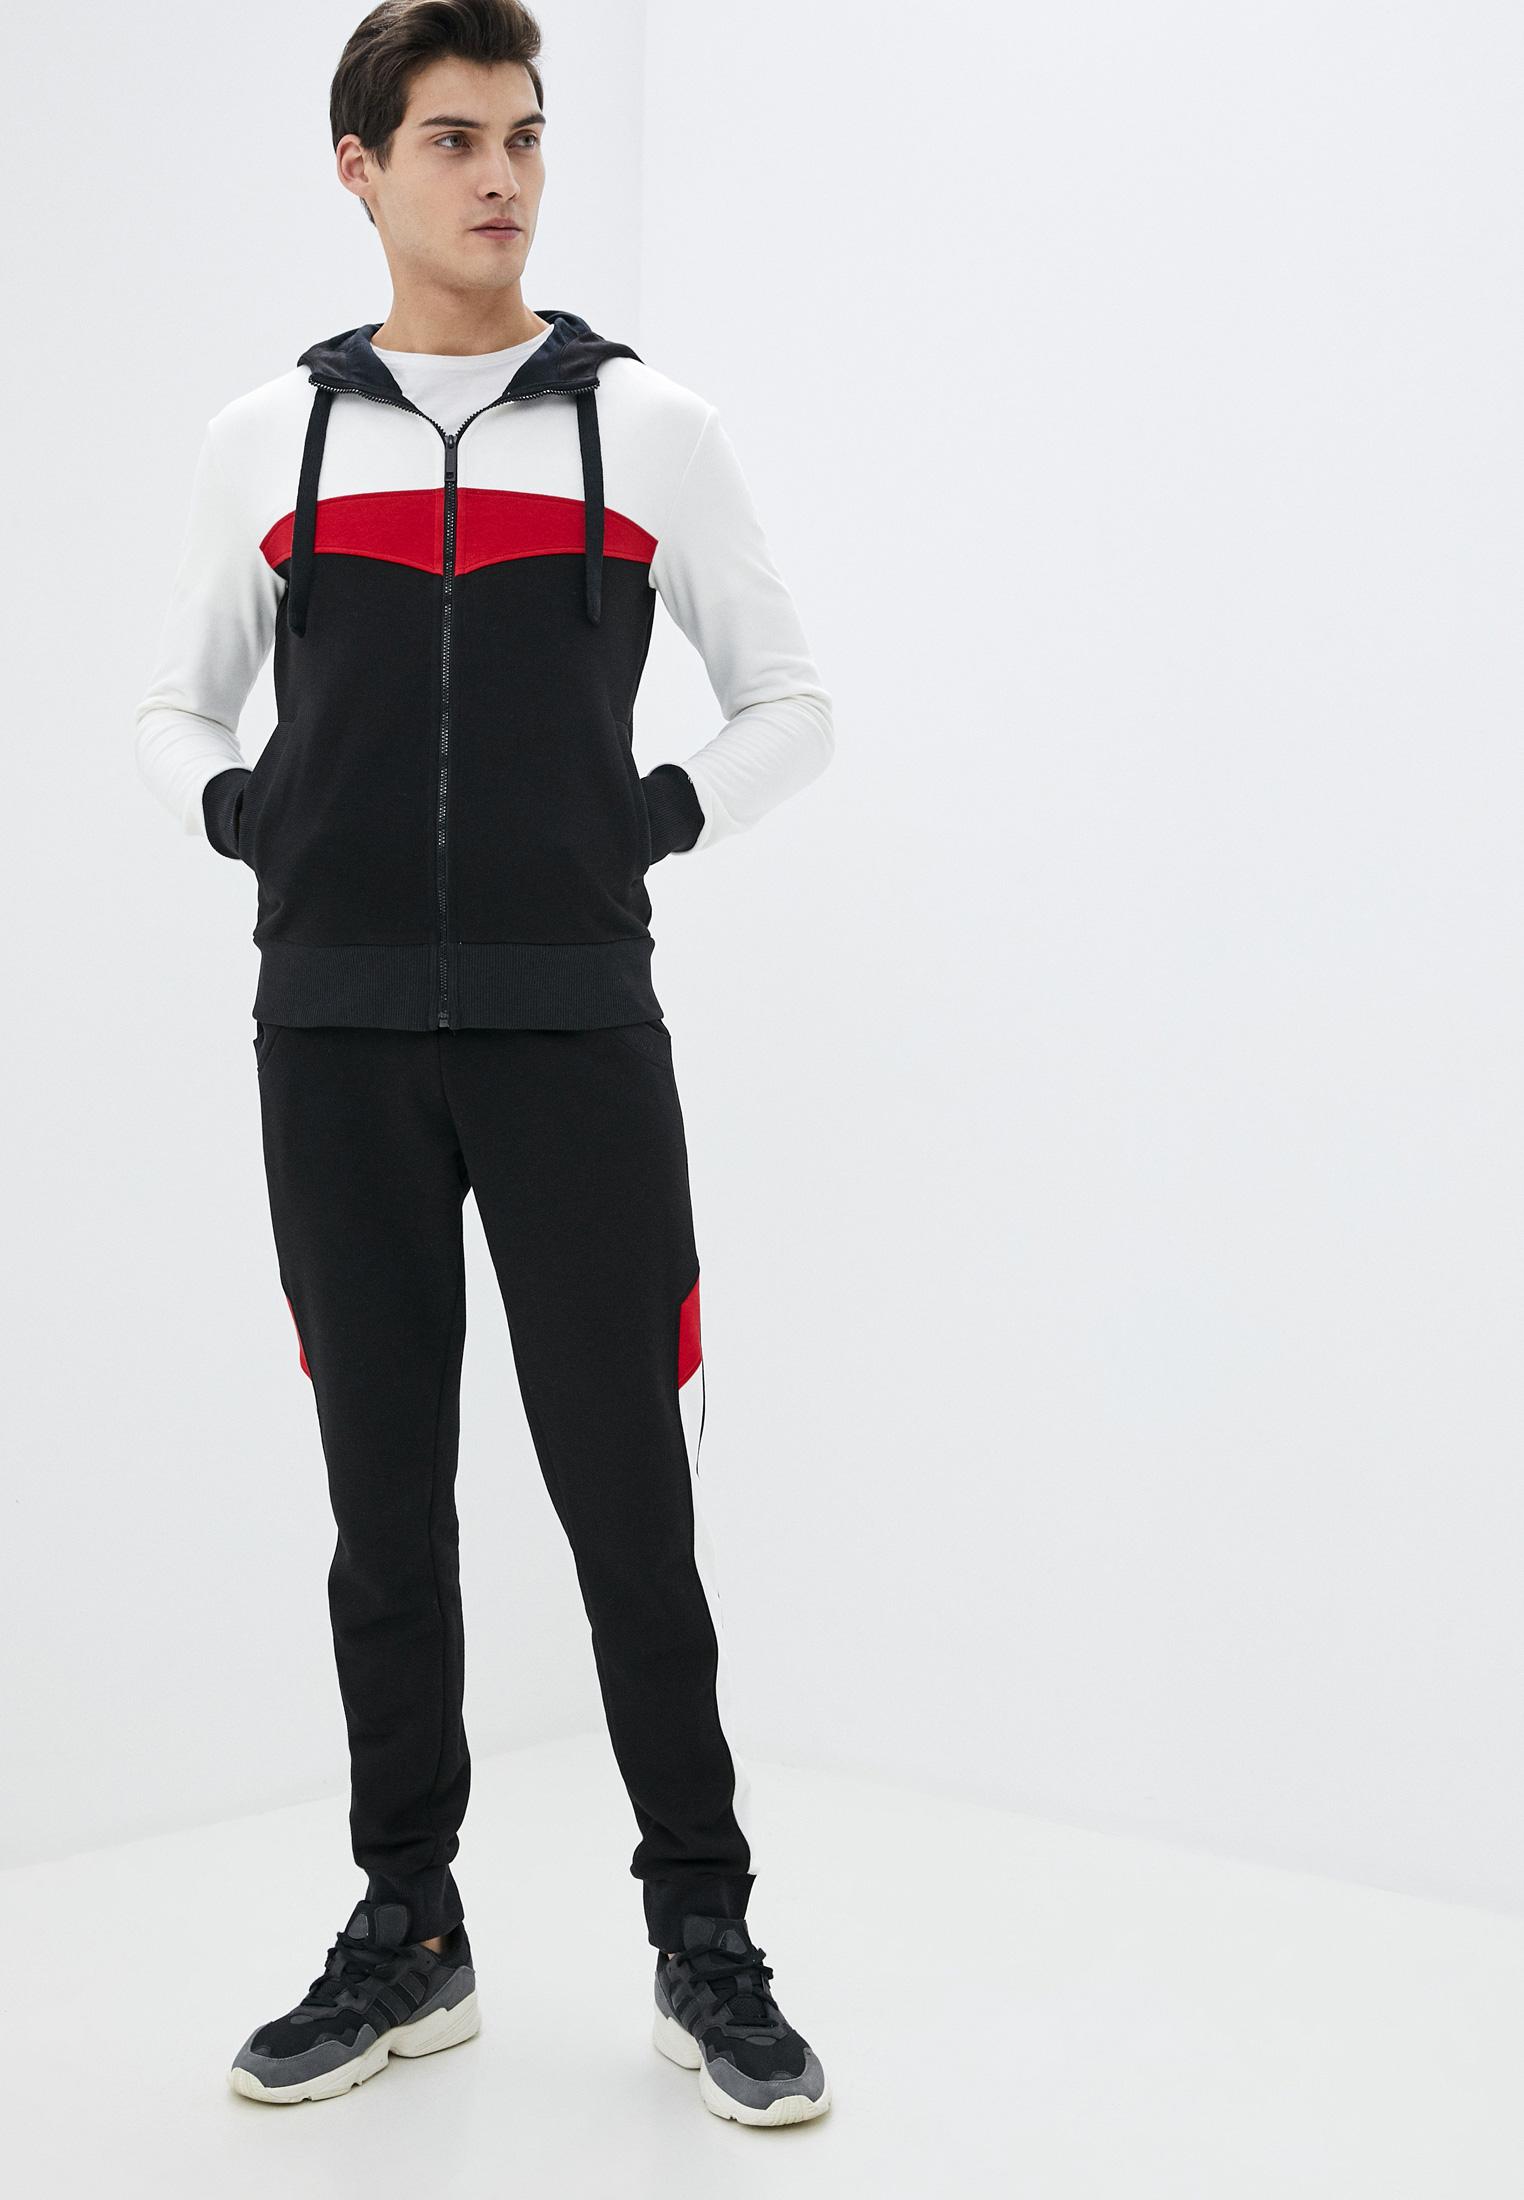 Спортивный костюм Sitlly 20805